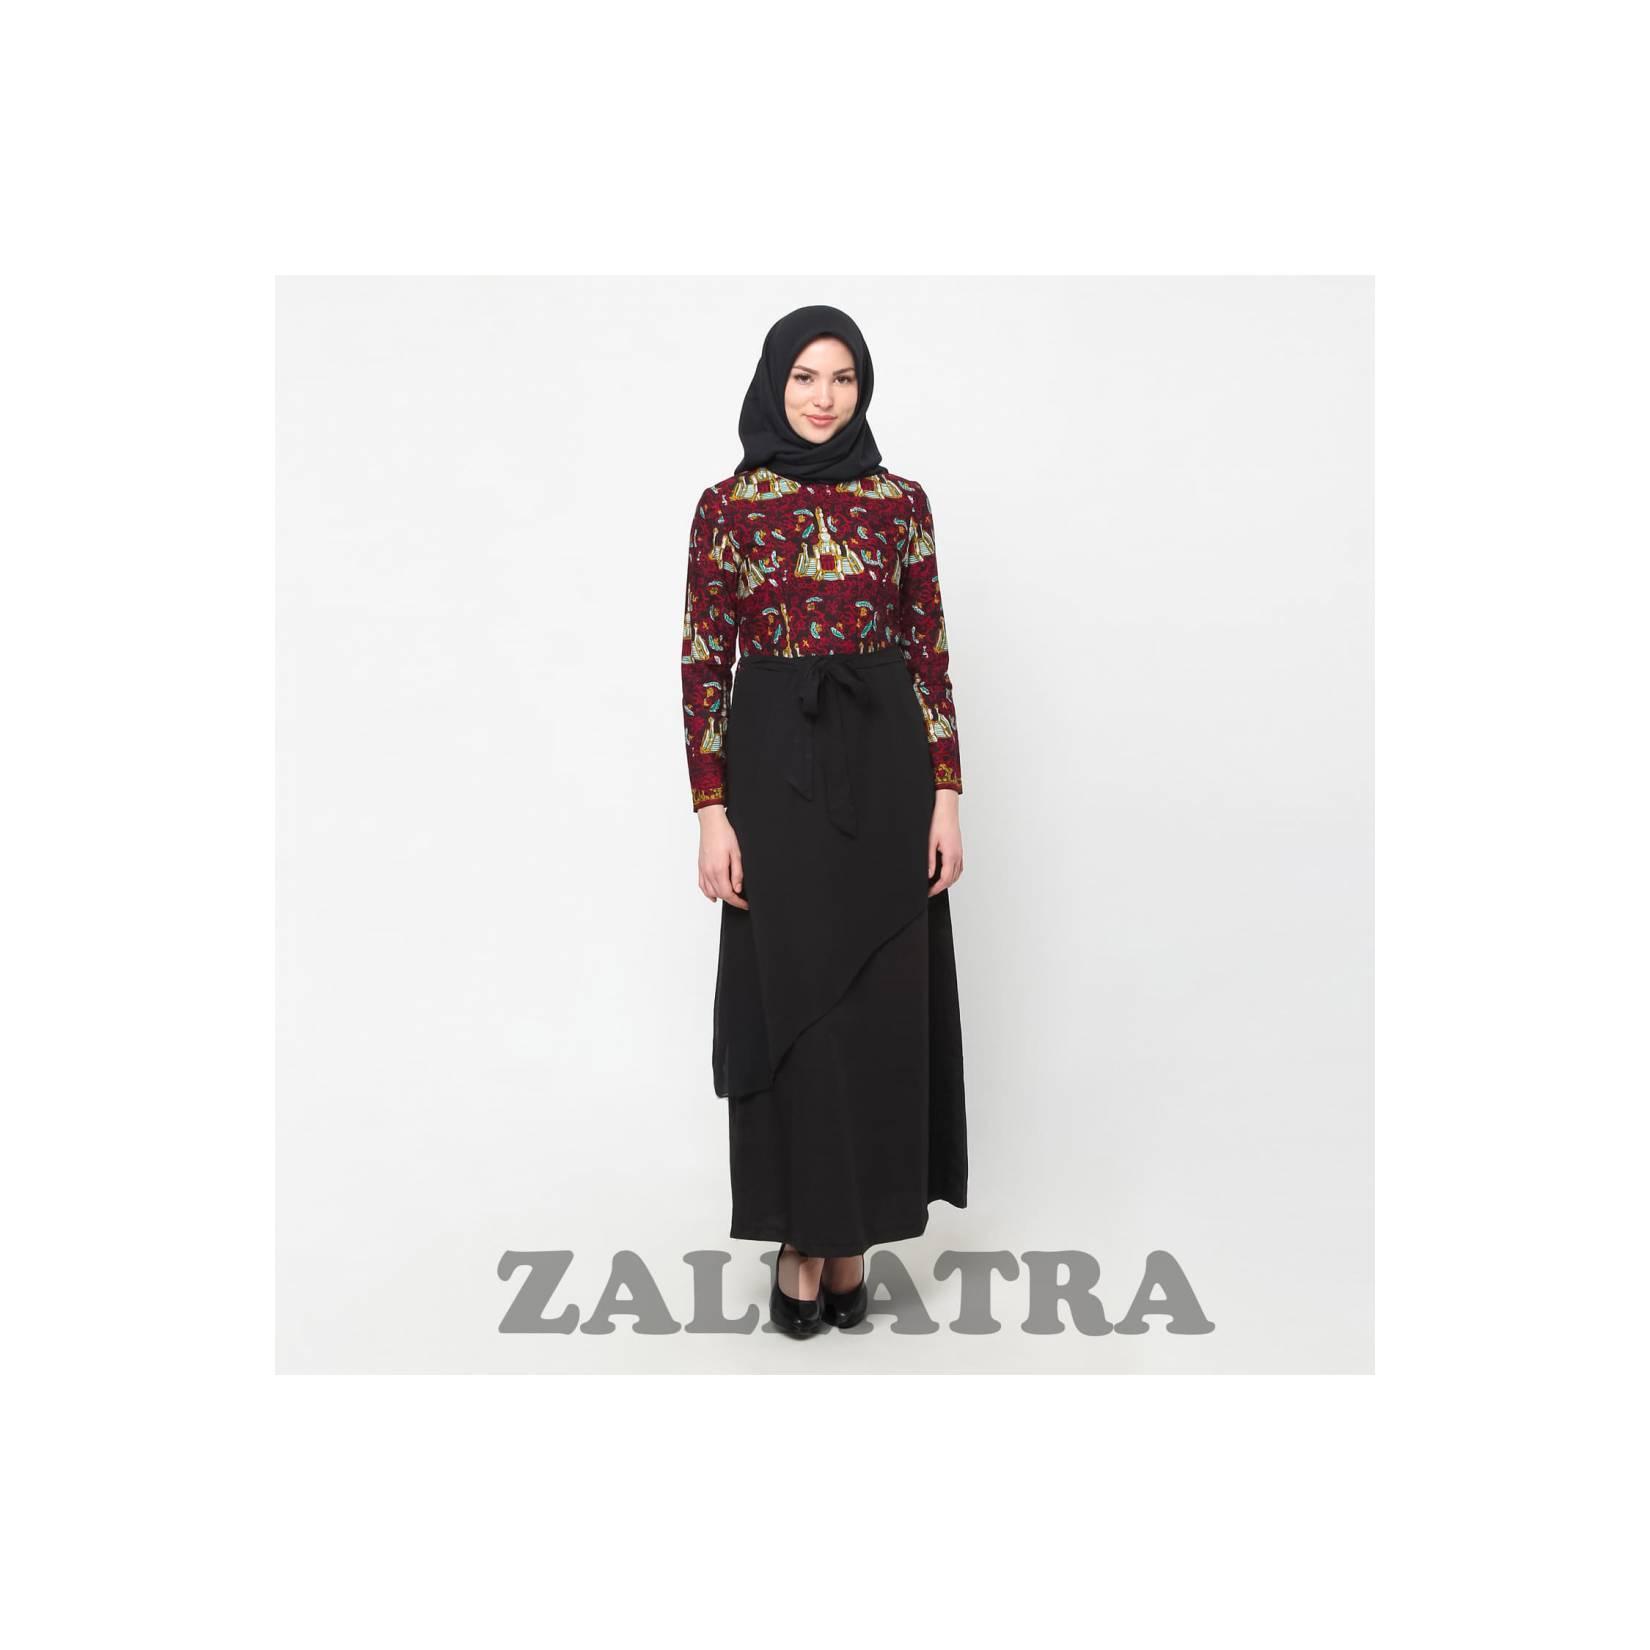 Gamis Batik Wanita Asli Jambi Berkualias - Zallatra GM04